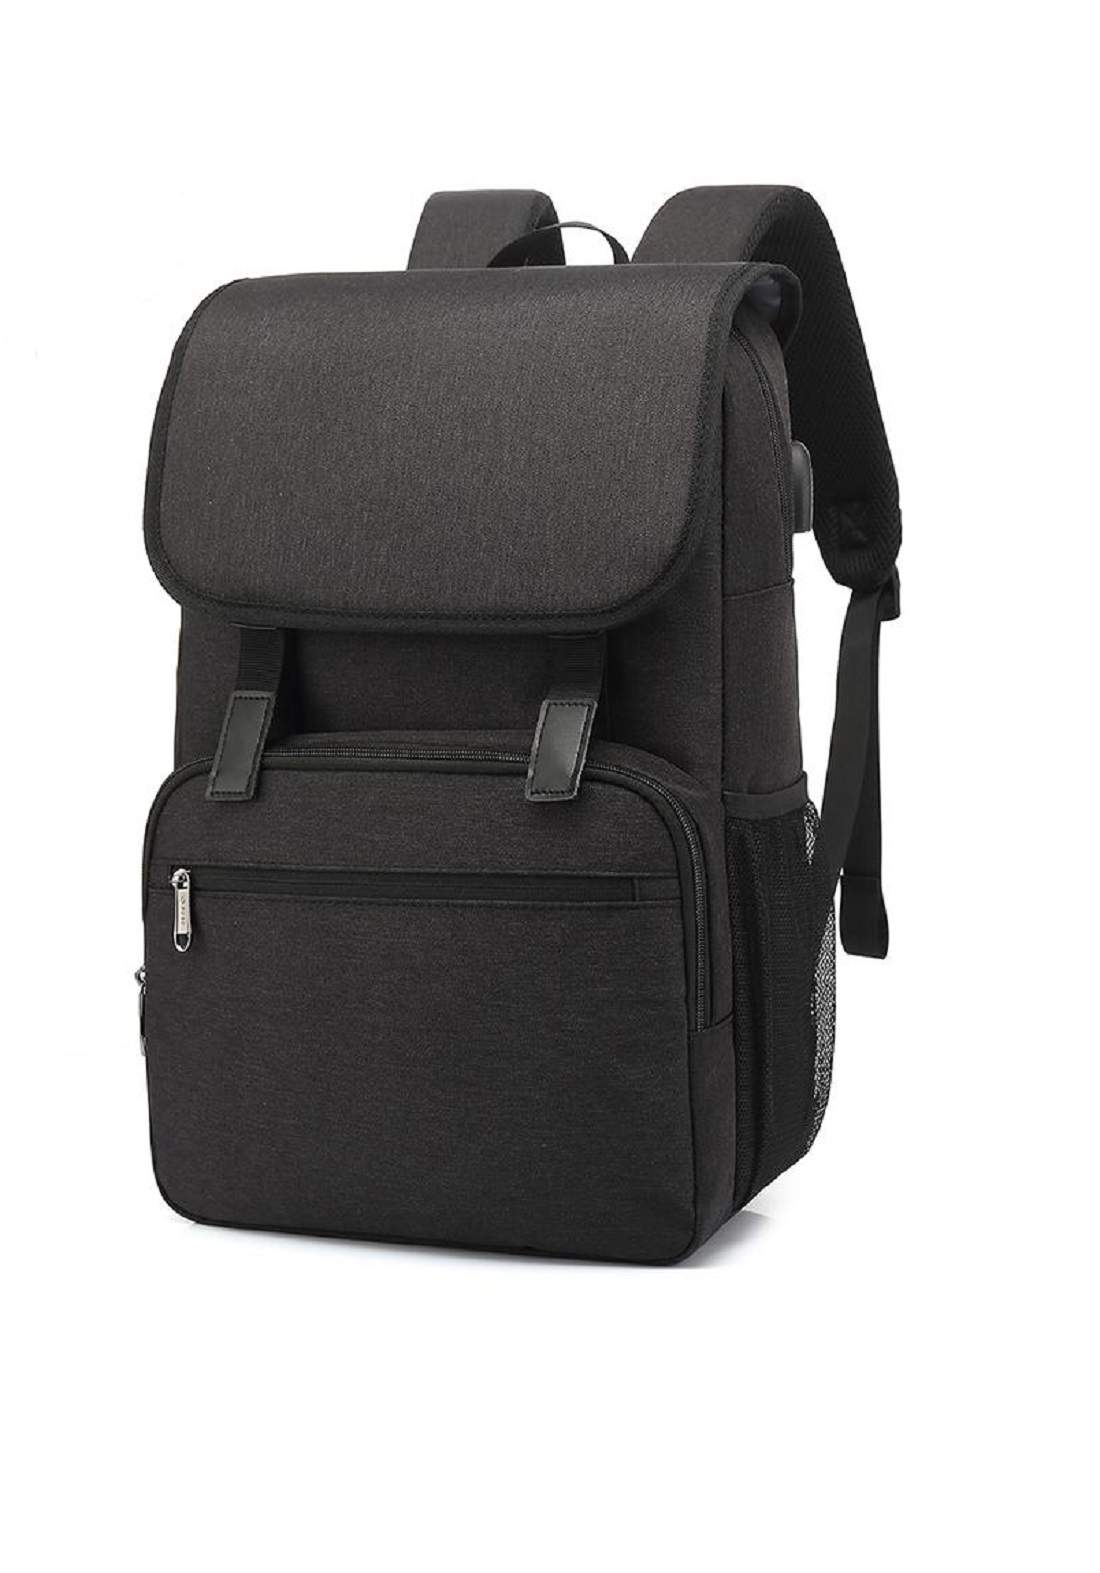 Poso PS-658 Backpack 15 Inch Bag with USB Port حقيبة لابتوب